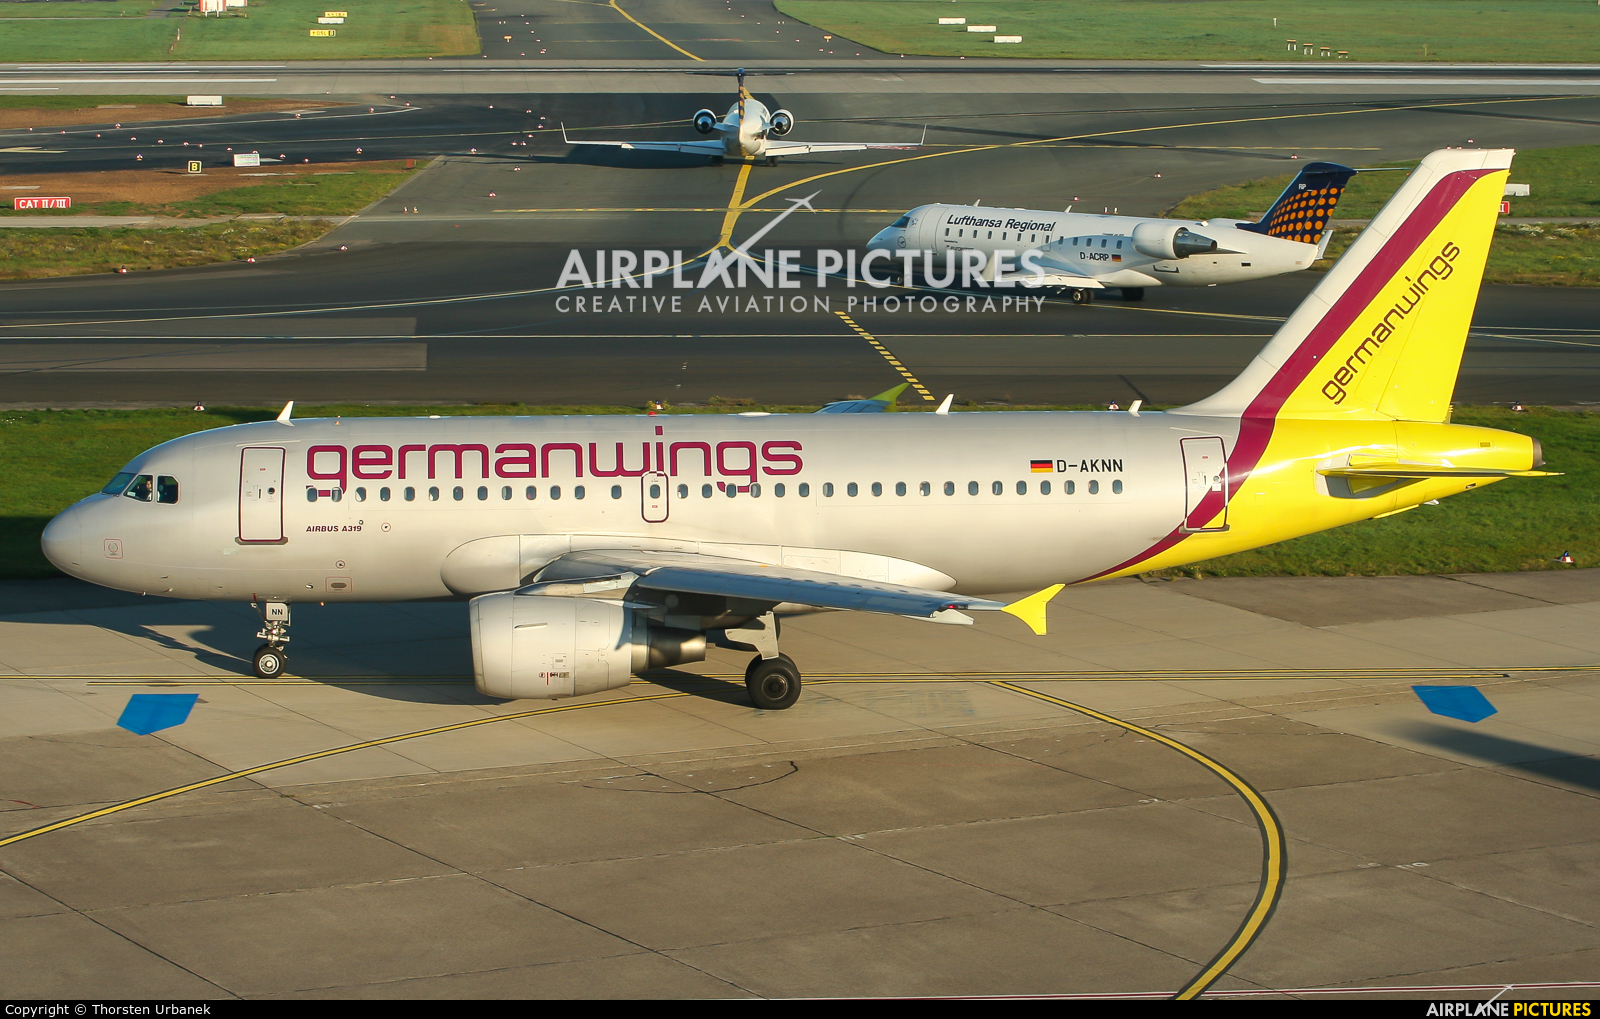 Germanwings D-AKNN aircraft at Düsseldorf